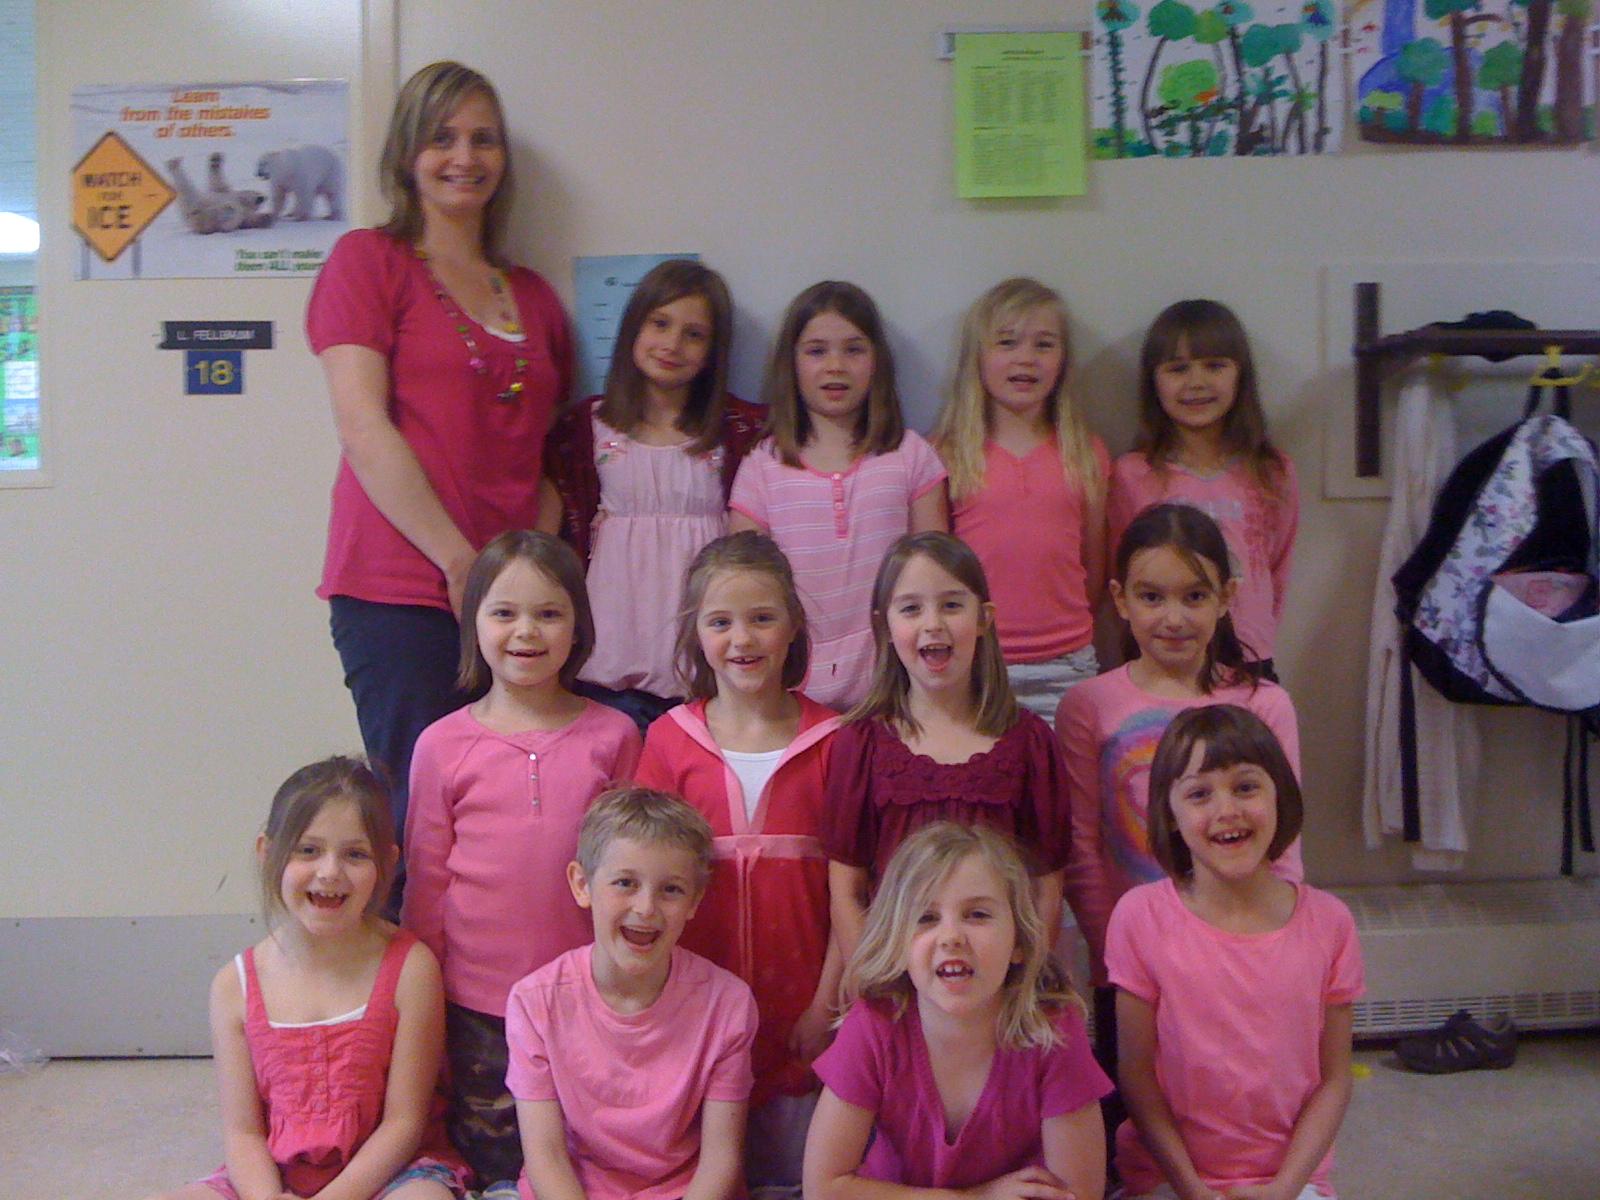 http://1.bp.blogspot.com/_IJCan_CRfqQ/S8cdA7ocsGI/AAAAAAAAAHA/V5F9cDK9vEs/s1600/pink+shirt+day+002.jpg